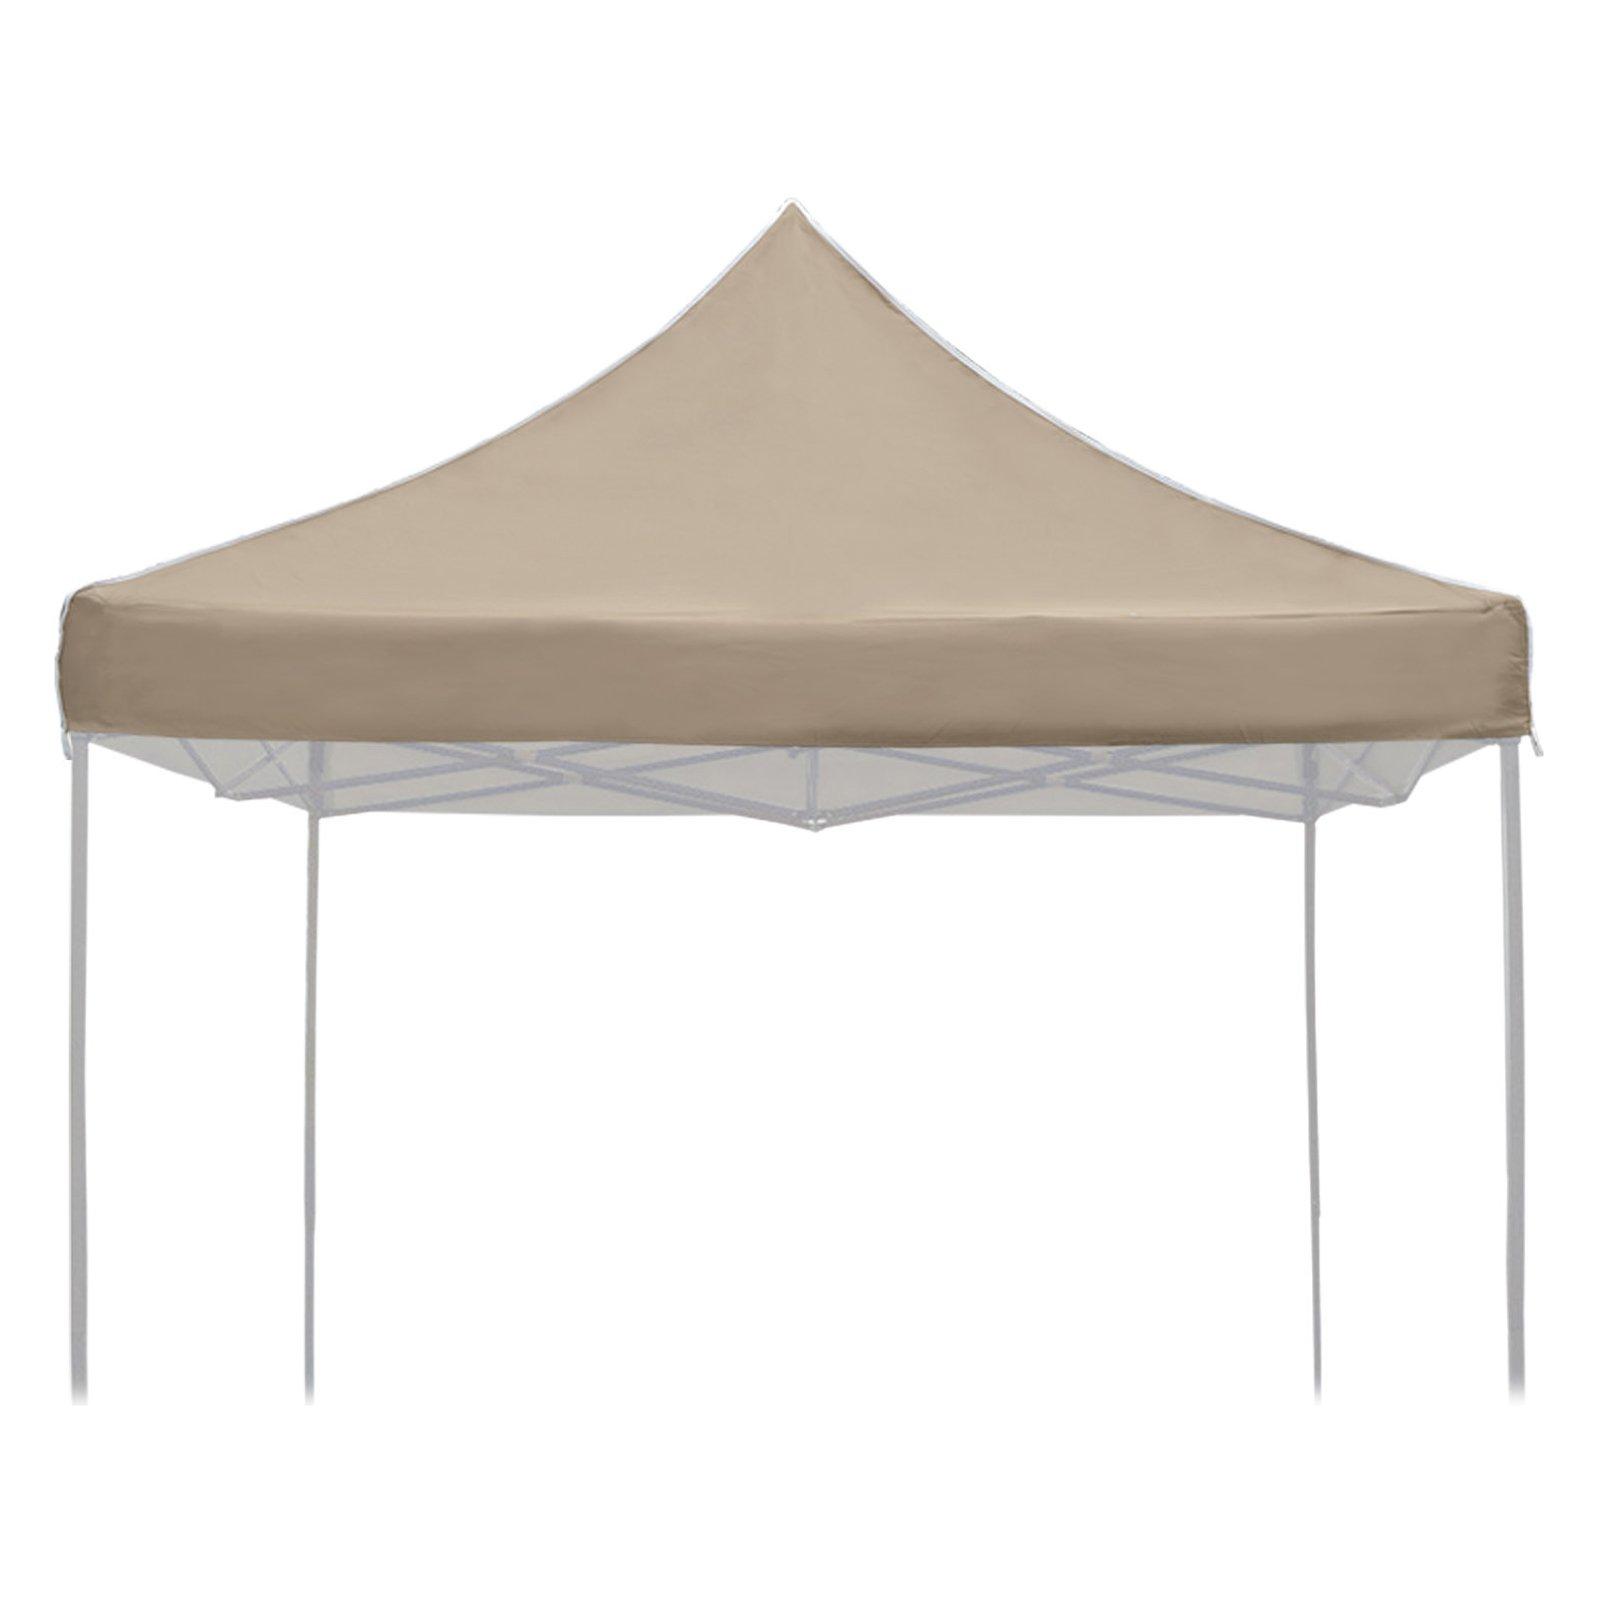 Sunrise Umbrella 10 x 10 ft. EZ Pop-Up Replacement Canopy...